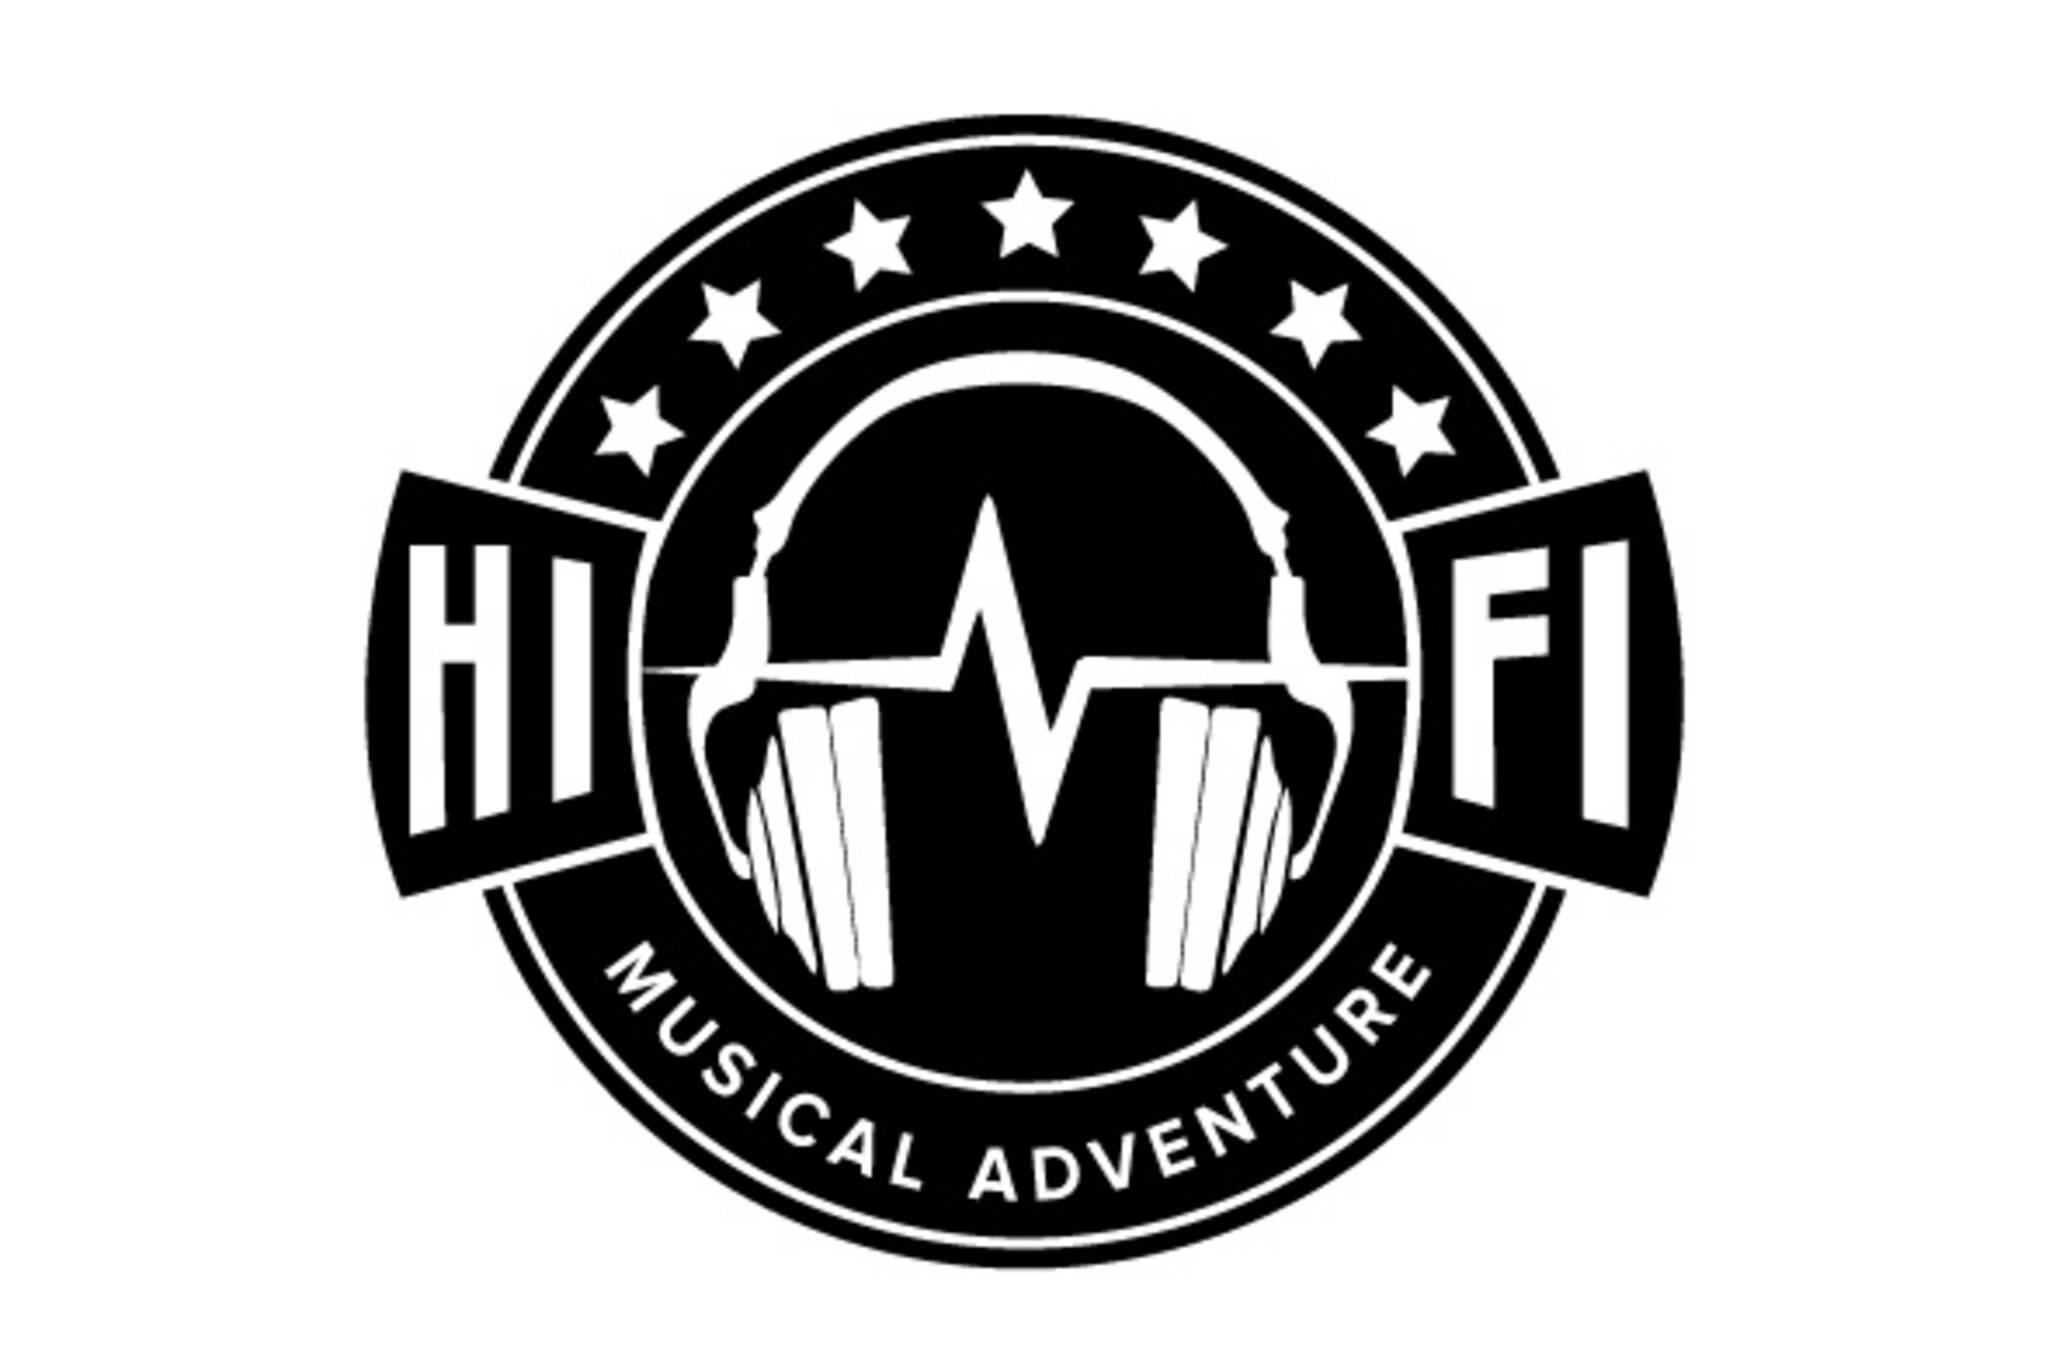 Hi Fi music festival toronto